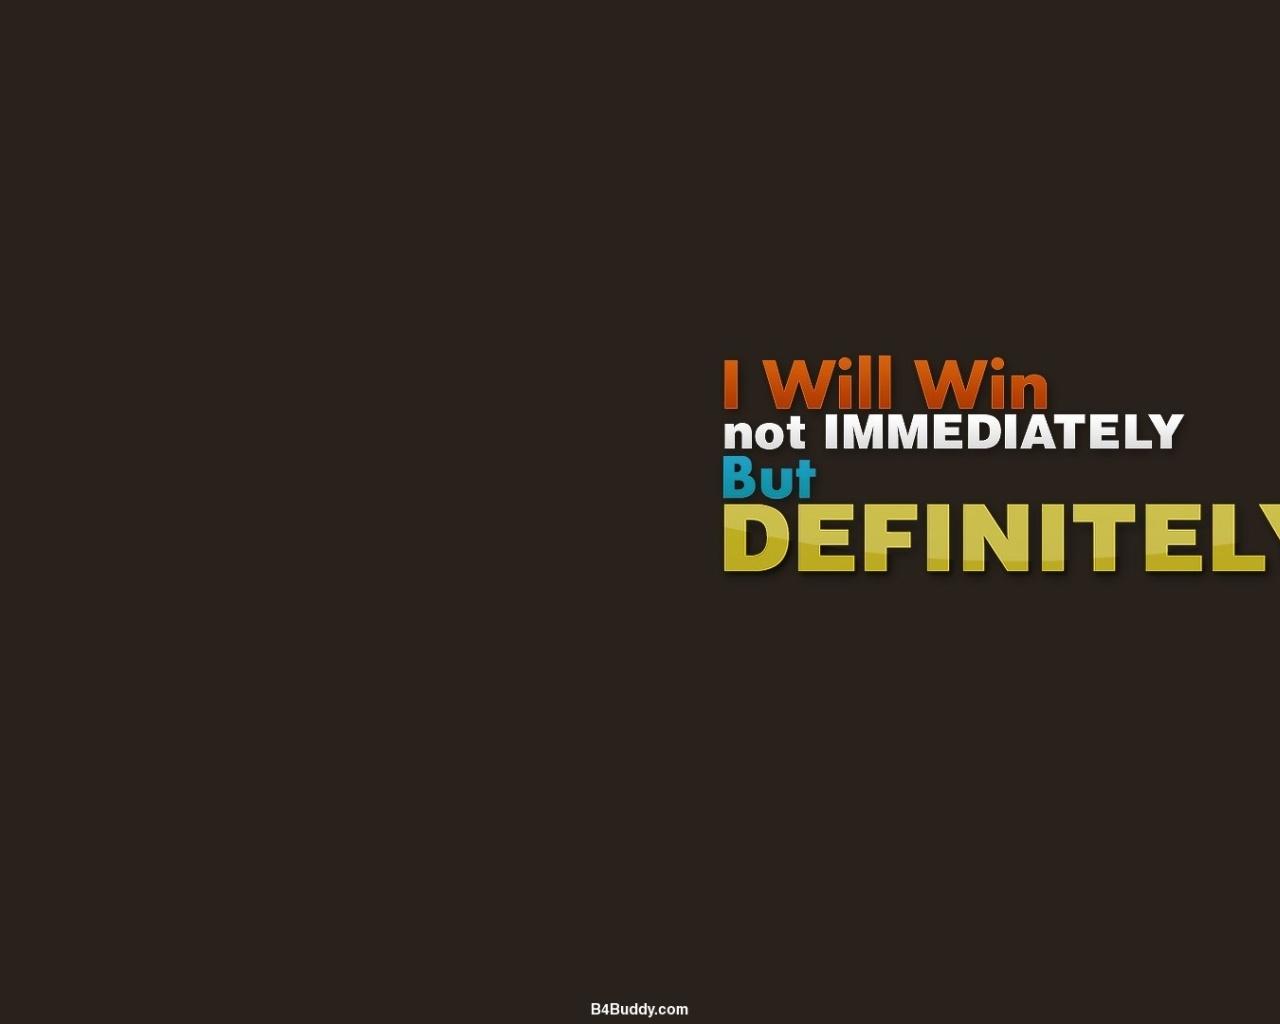 1280x1024 Motivational Quote Wallpaper desktop PC and Mac wallpaper 1280x1024